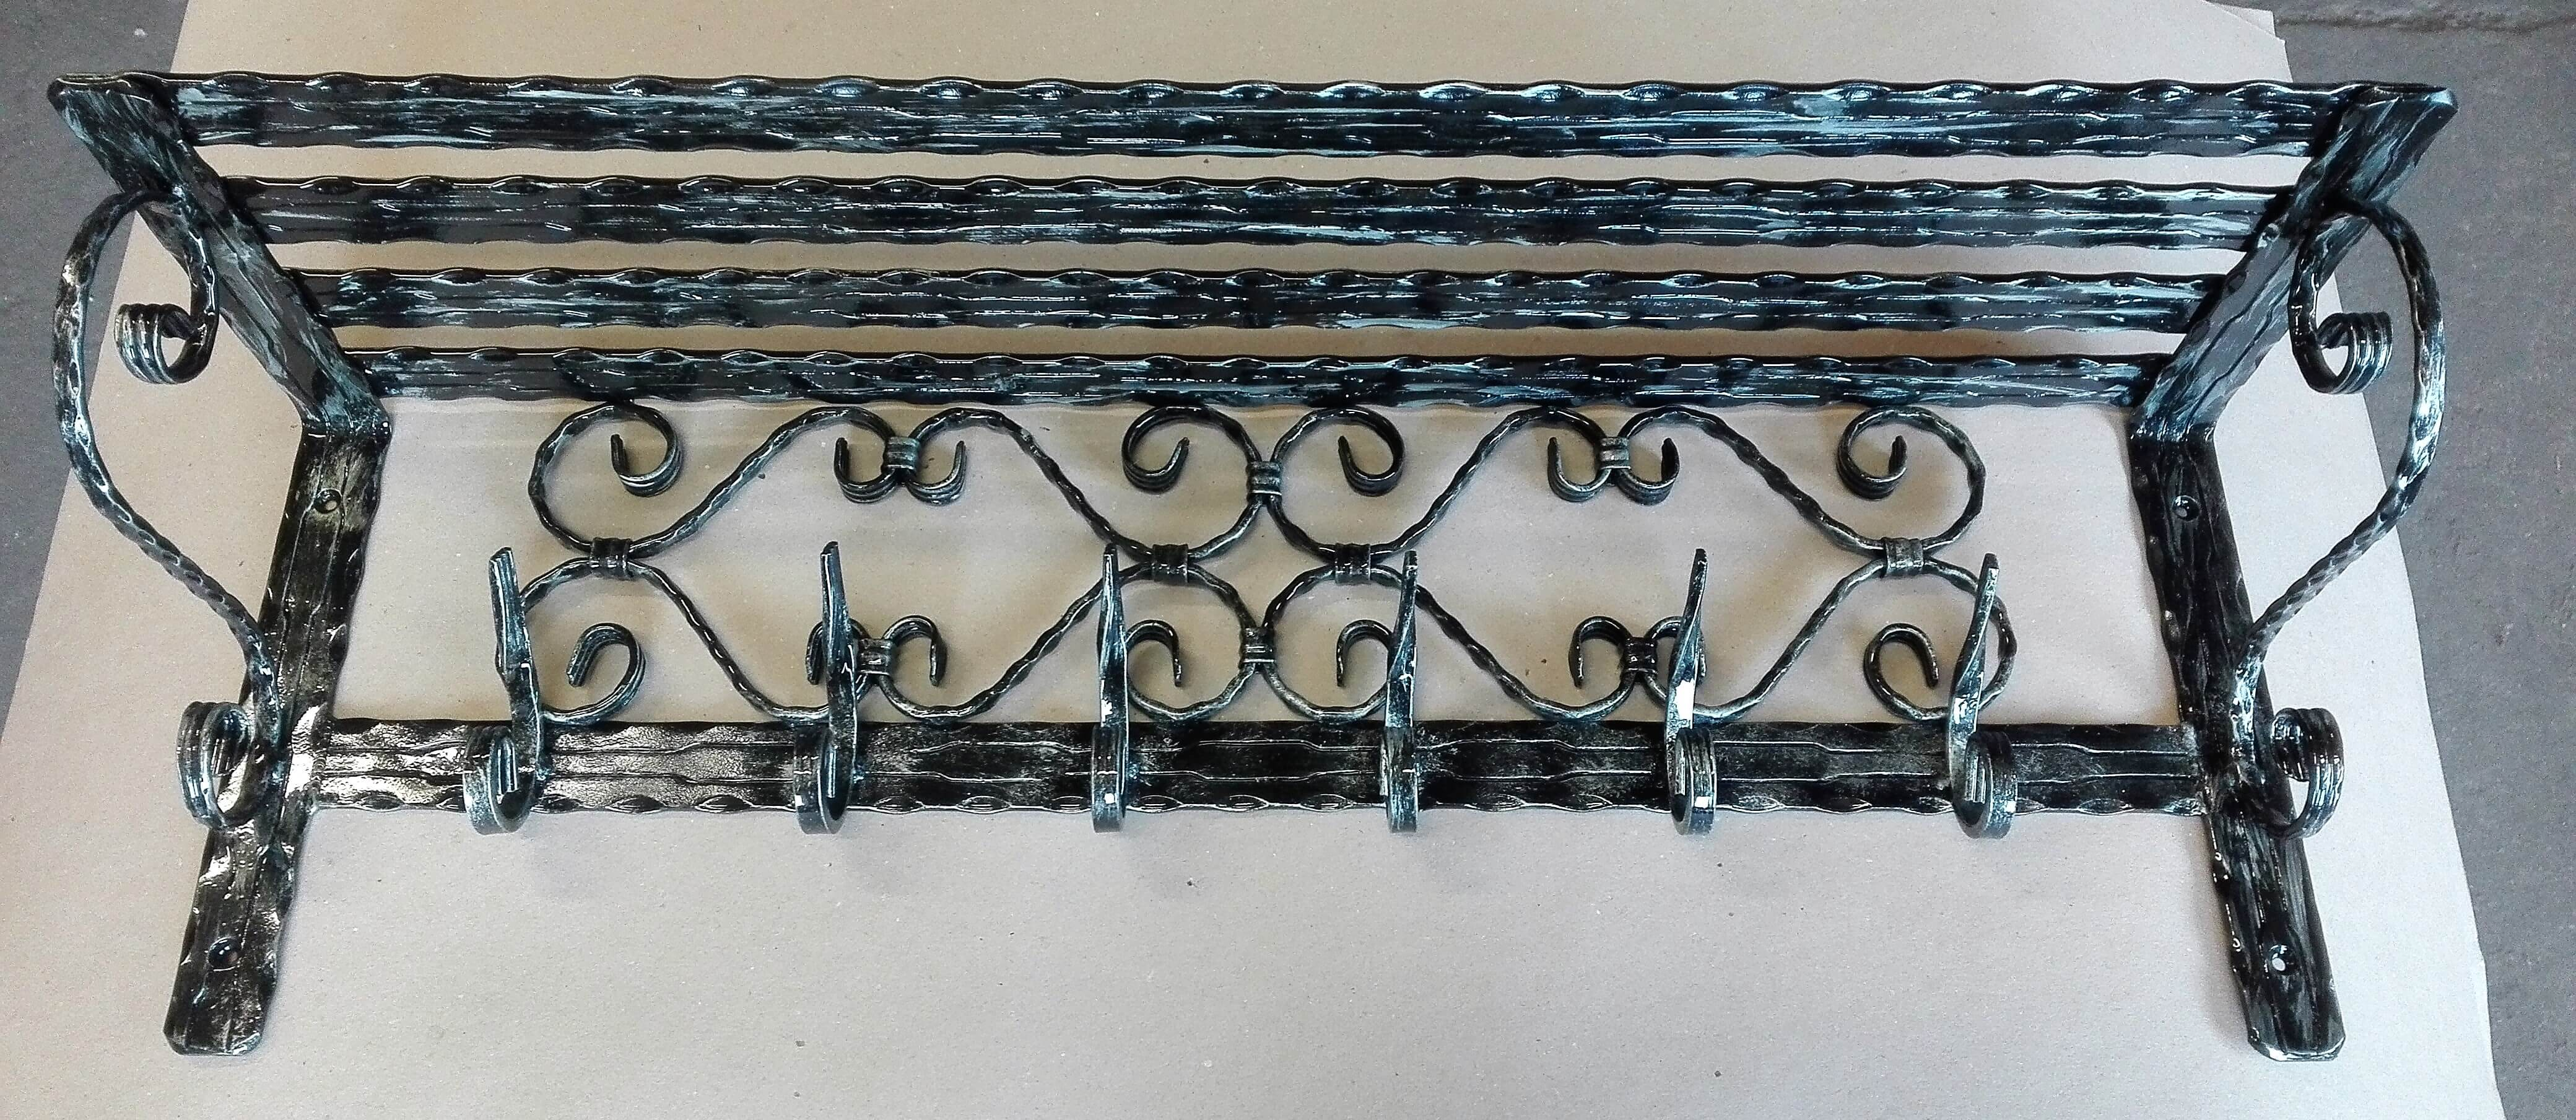 kovaný vešiak, kovaný věšák, handmade, furniture, rustic, metal, iron, Kleiderablage, geschmiedeter Aufhänger, Hakenregal, Porte-manteau, Étagère crochet, Appendiabiti, Scaffale, Perchero, Estante de gancho